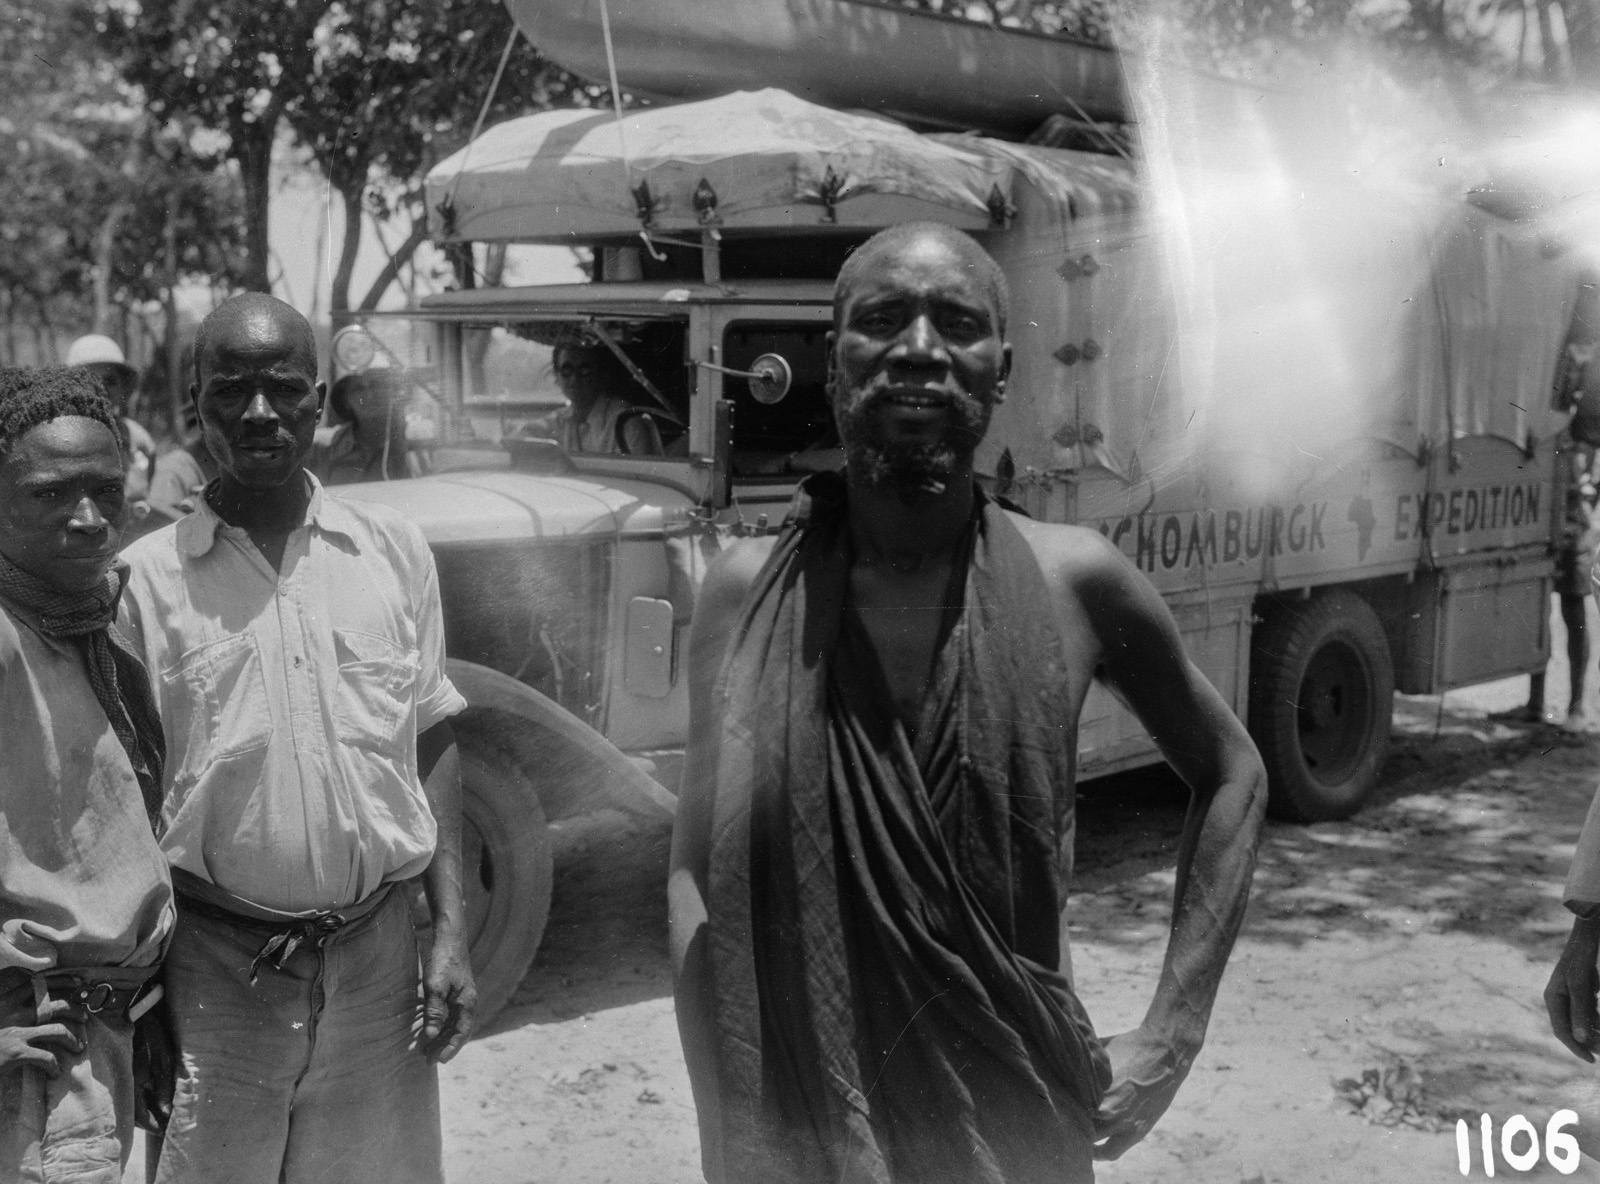 1106. Лундази. Трое мужчин перед грузовиком экспедиции